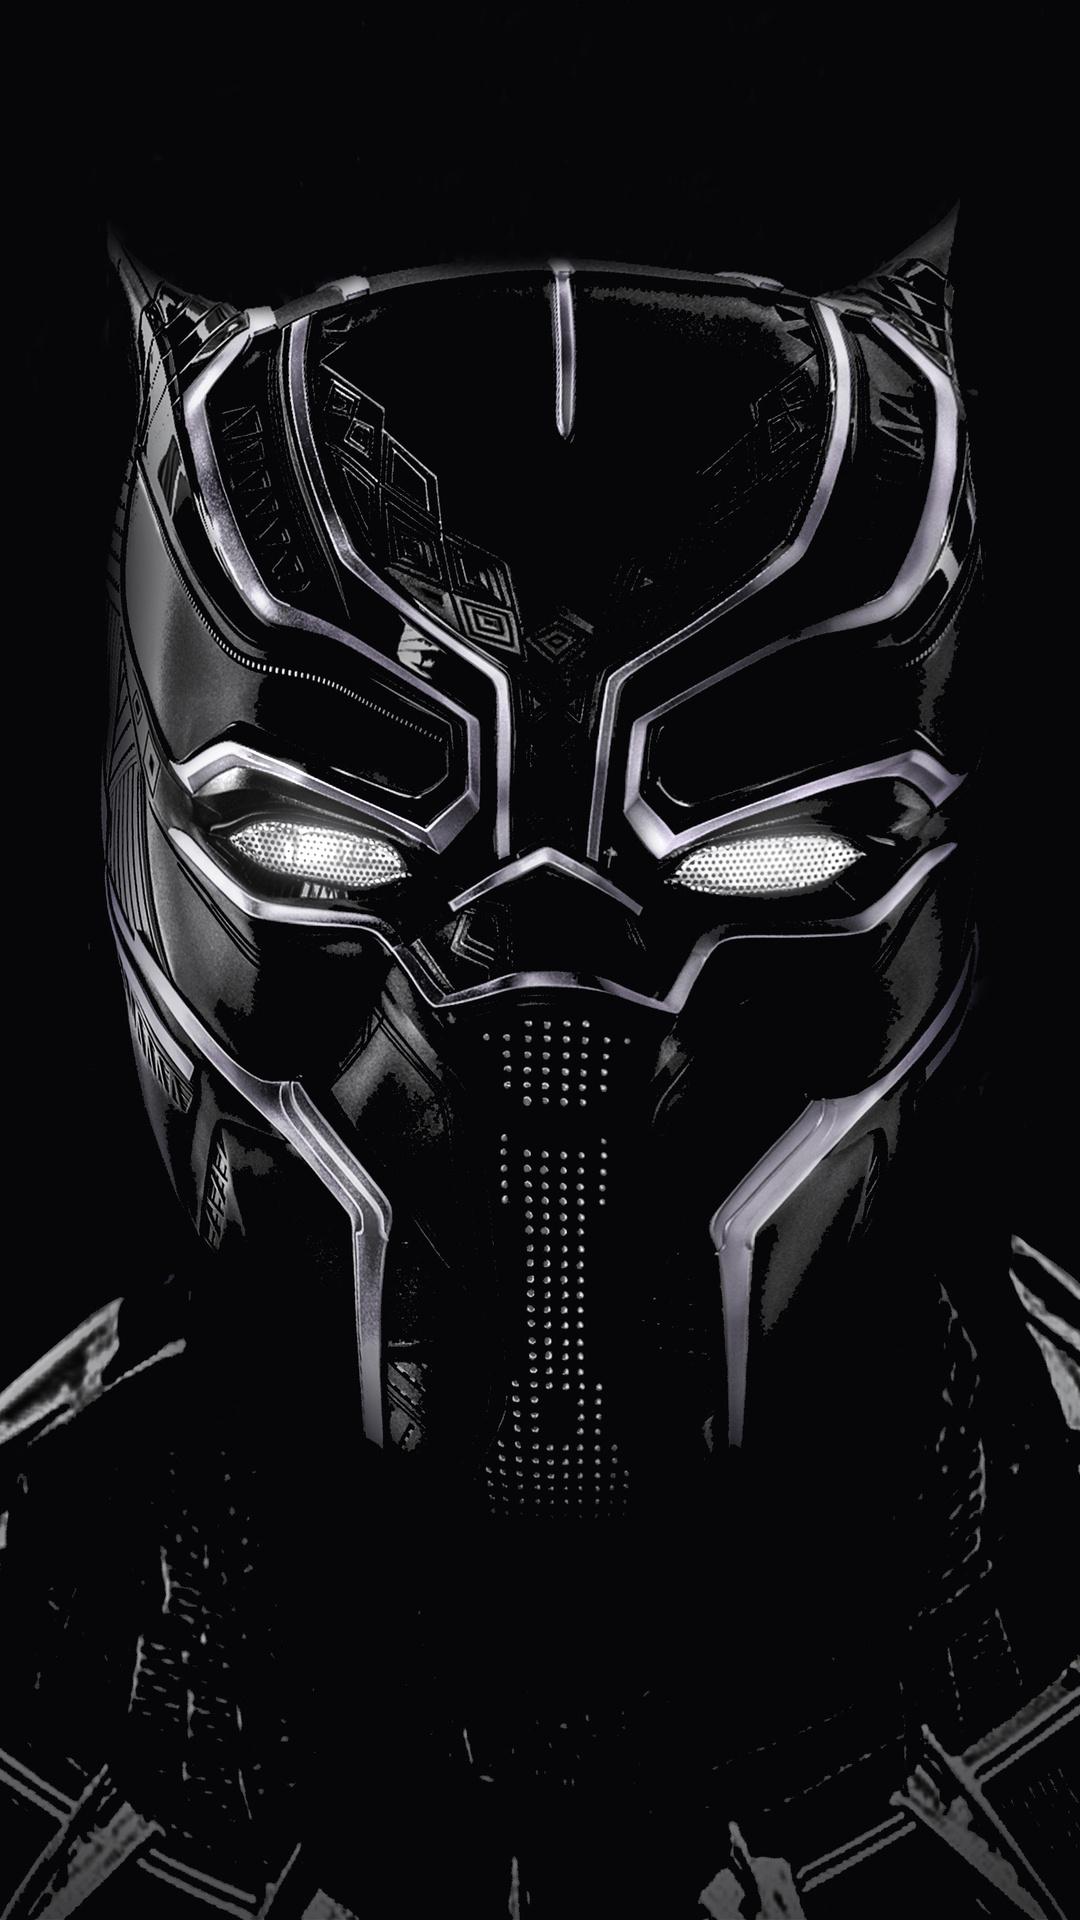 1080x1920 Black Panther Artwork 5k Iphone 7,6s,6 Plus ...